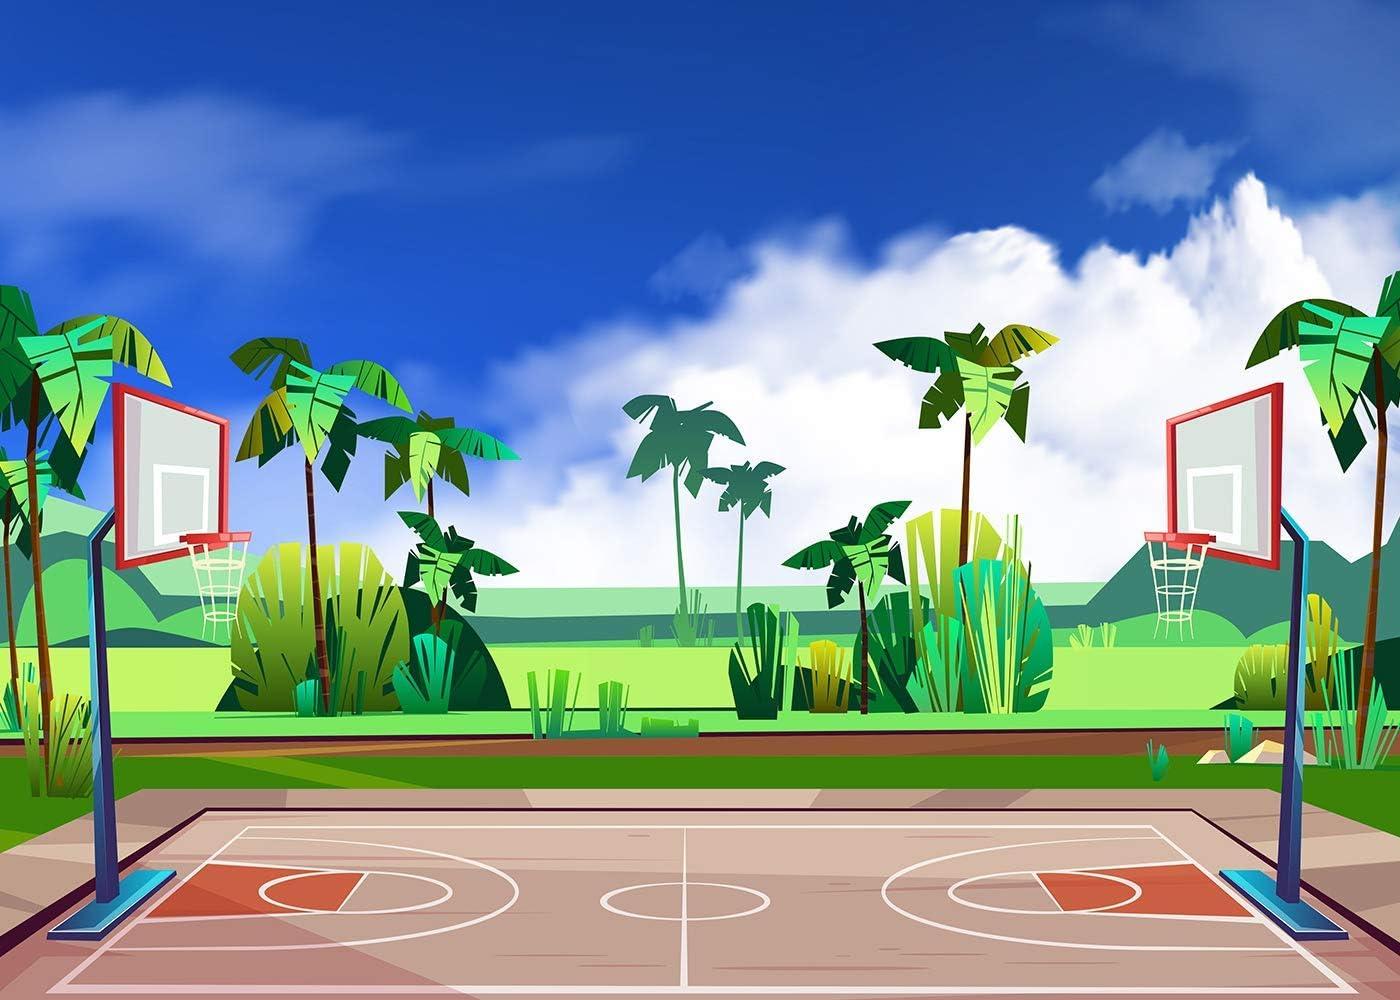 15x10ft Basketball Background Sports Photography Backdrop Photo Studio Props LHFU121